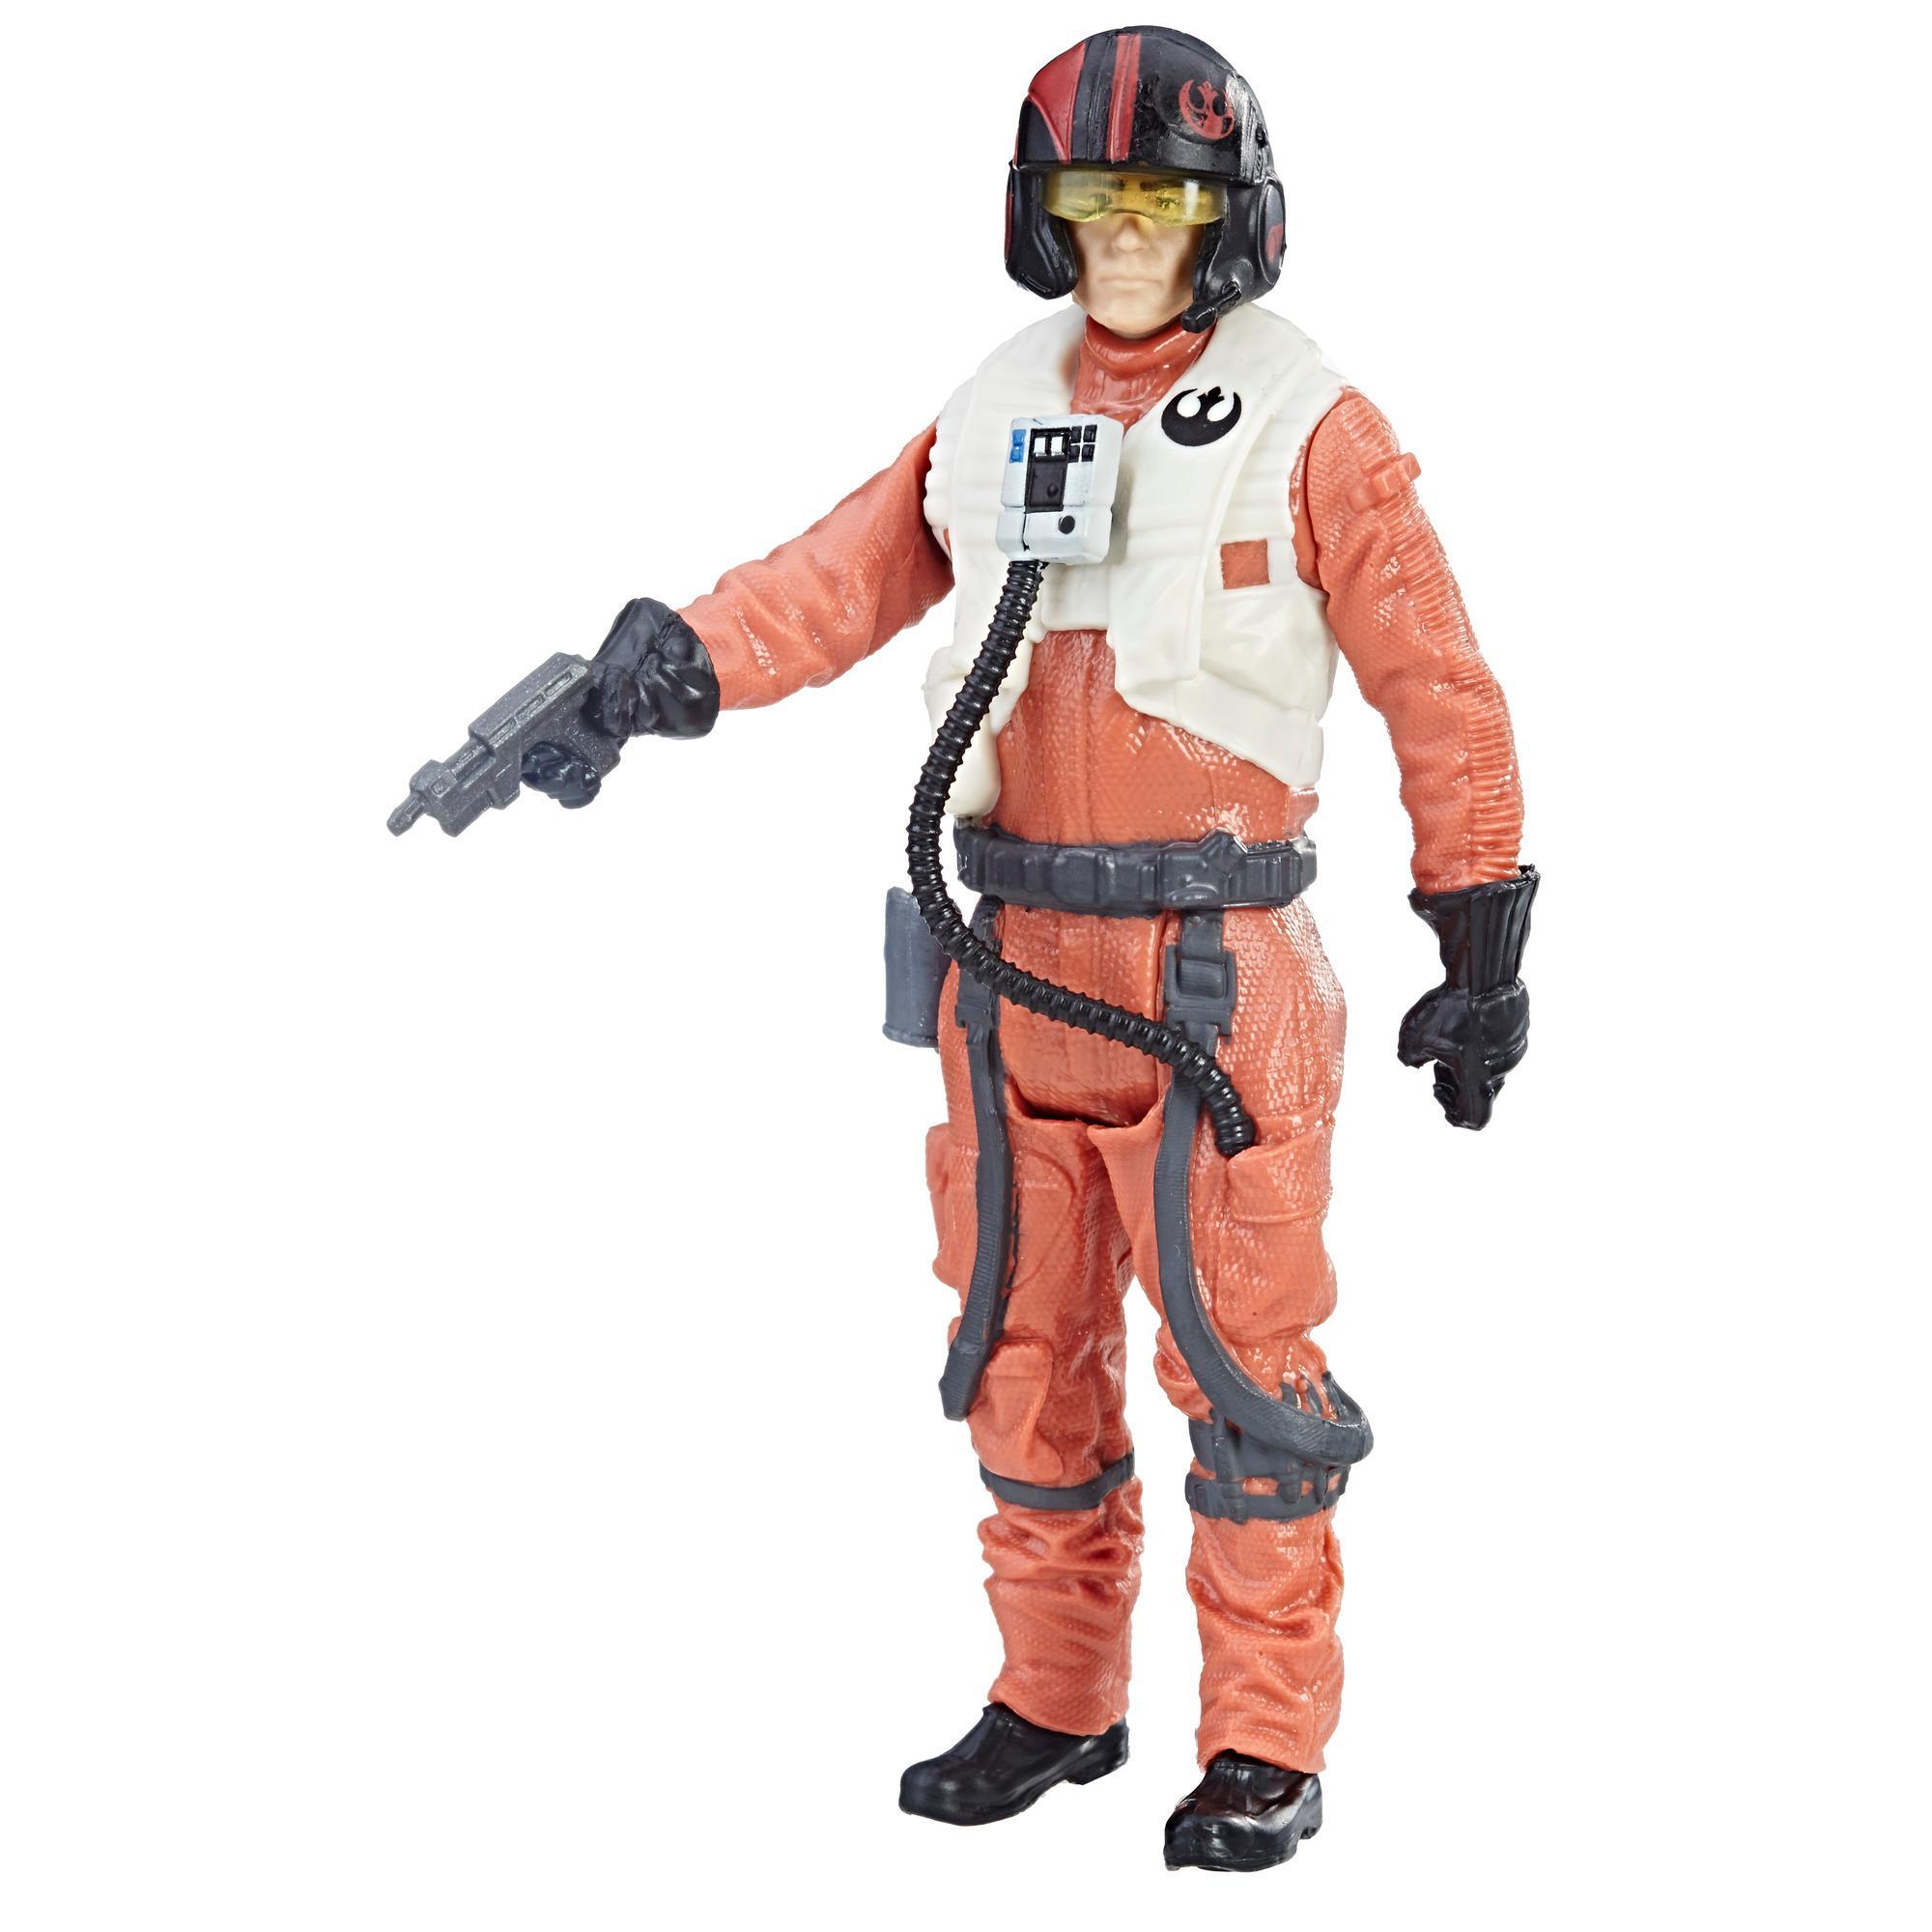 Star Wars - Poe Dameron (Piloto de la Resistencia) Figura Force Link